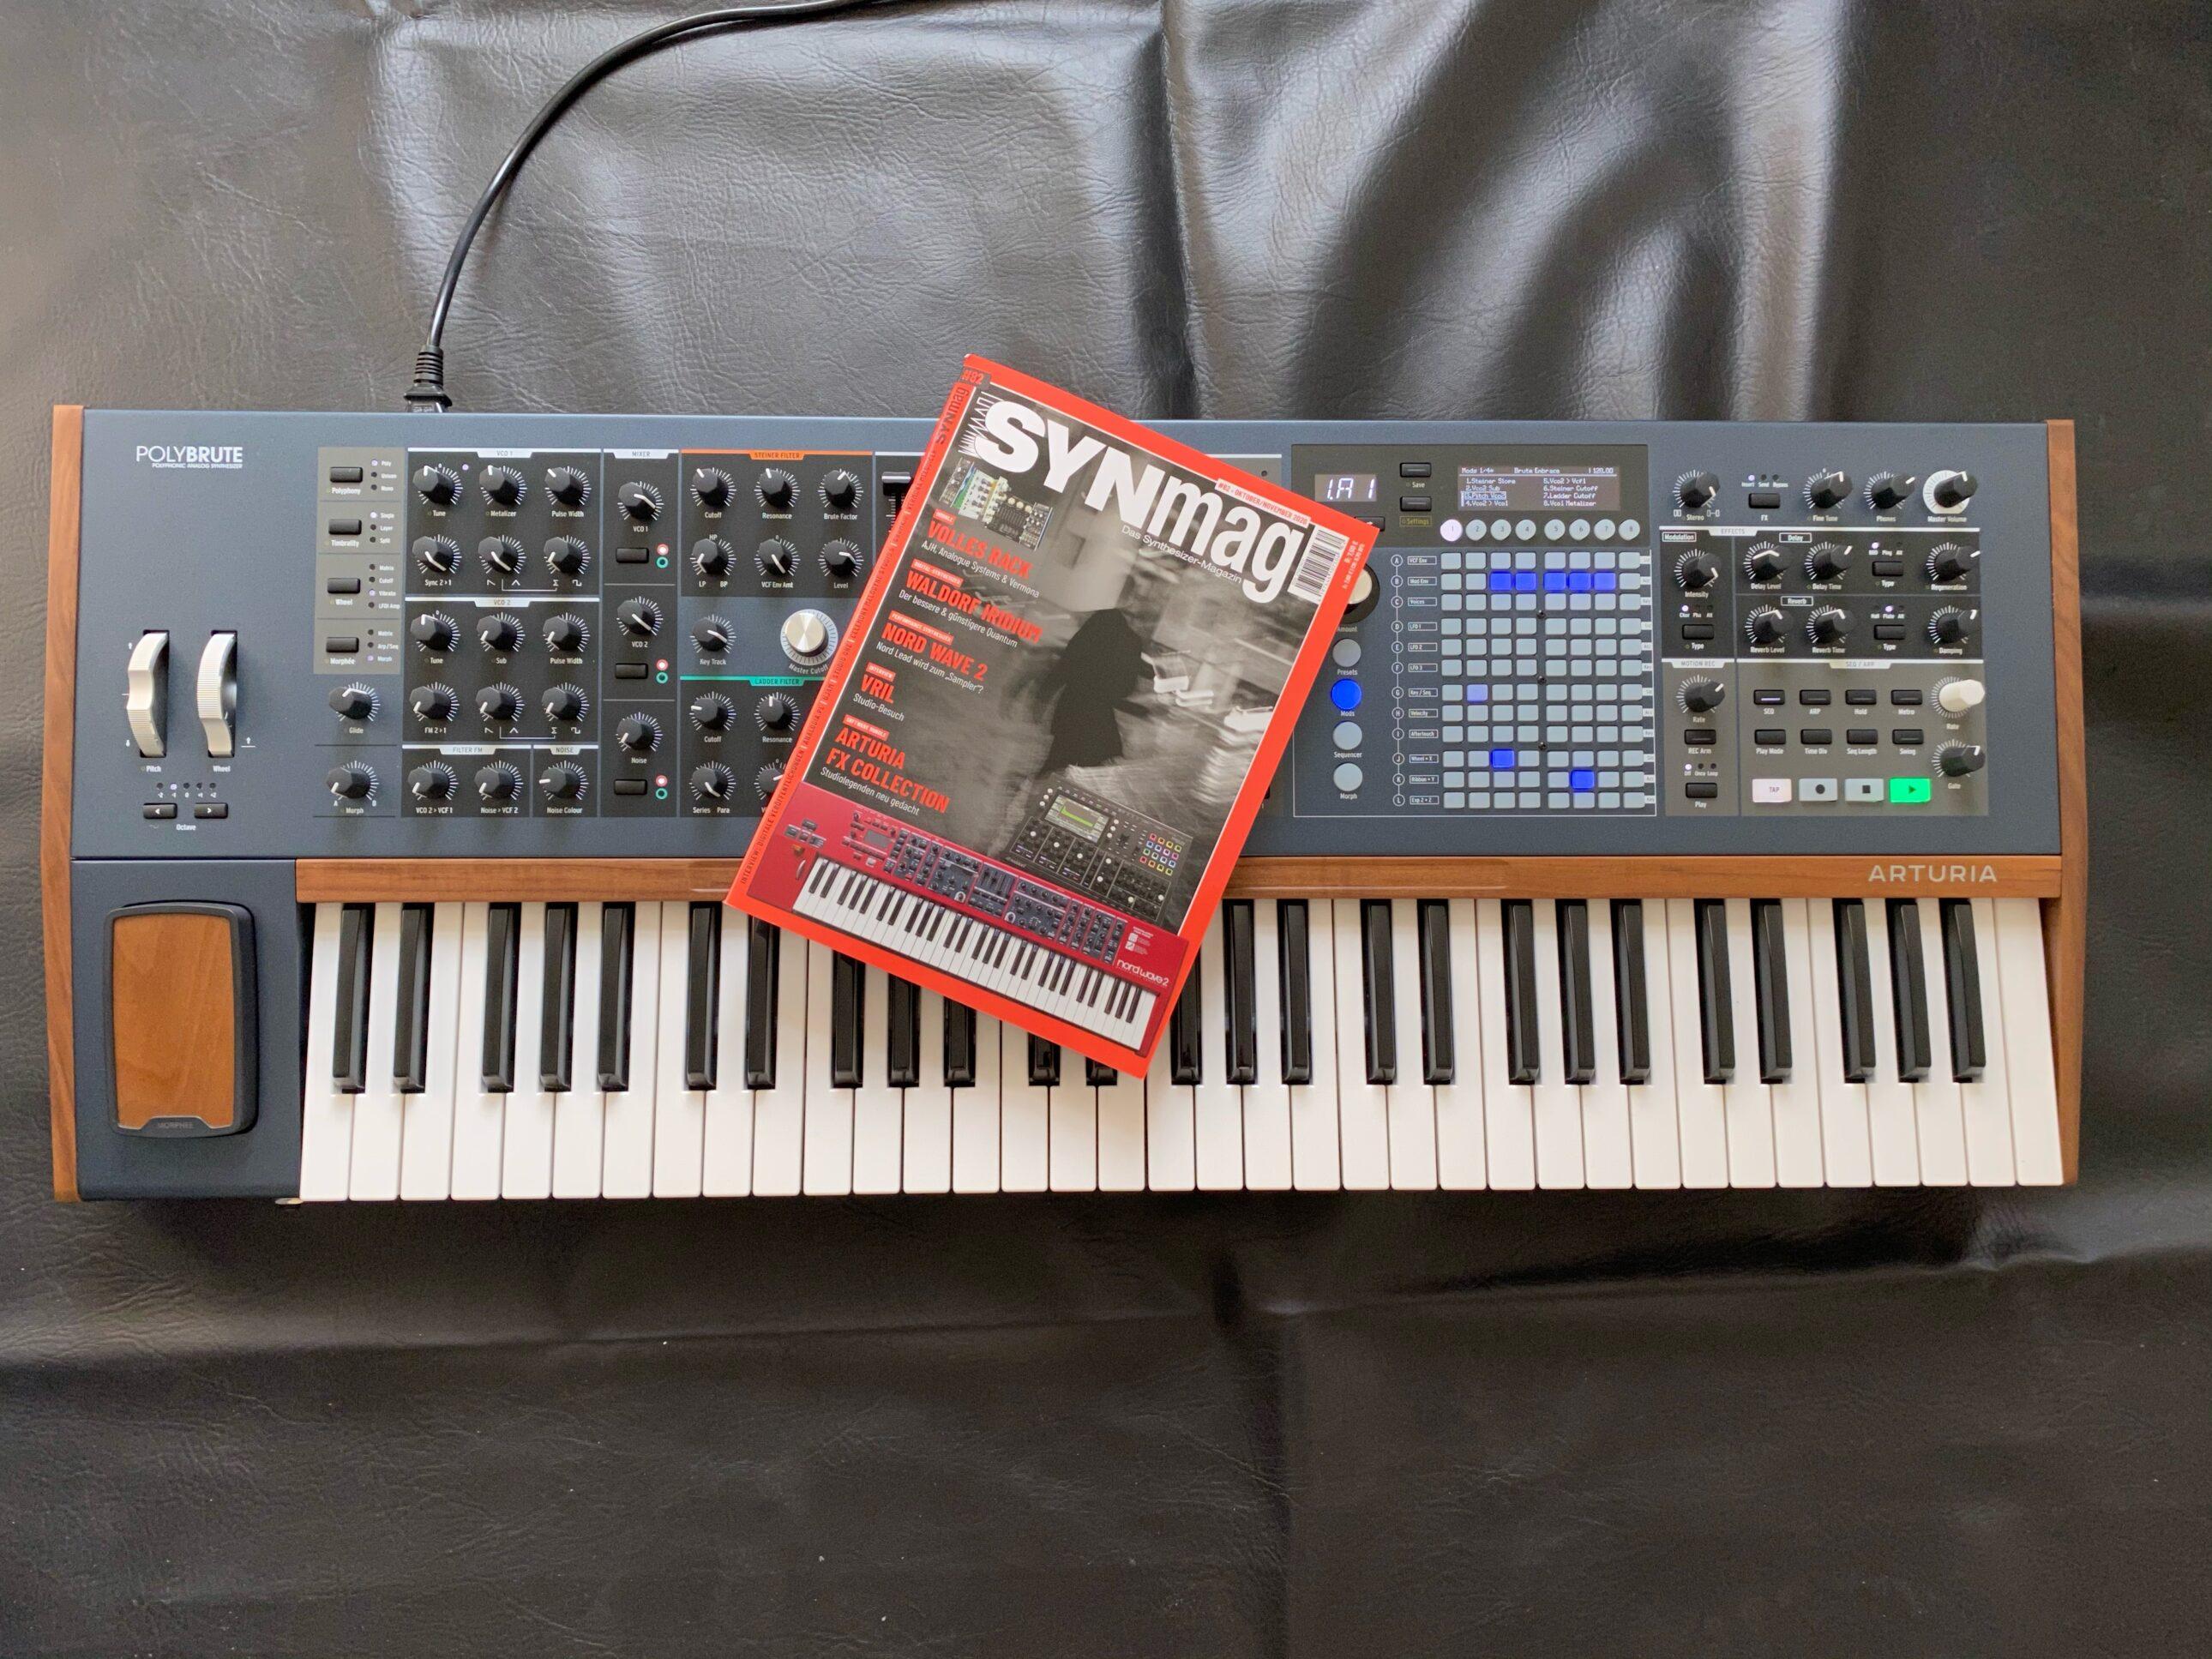 Arturia Polybrute im SynMag 84